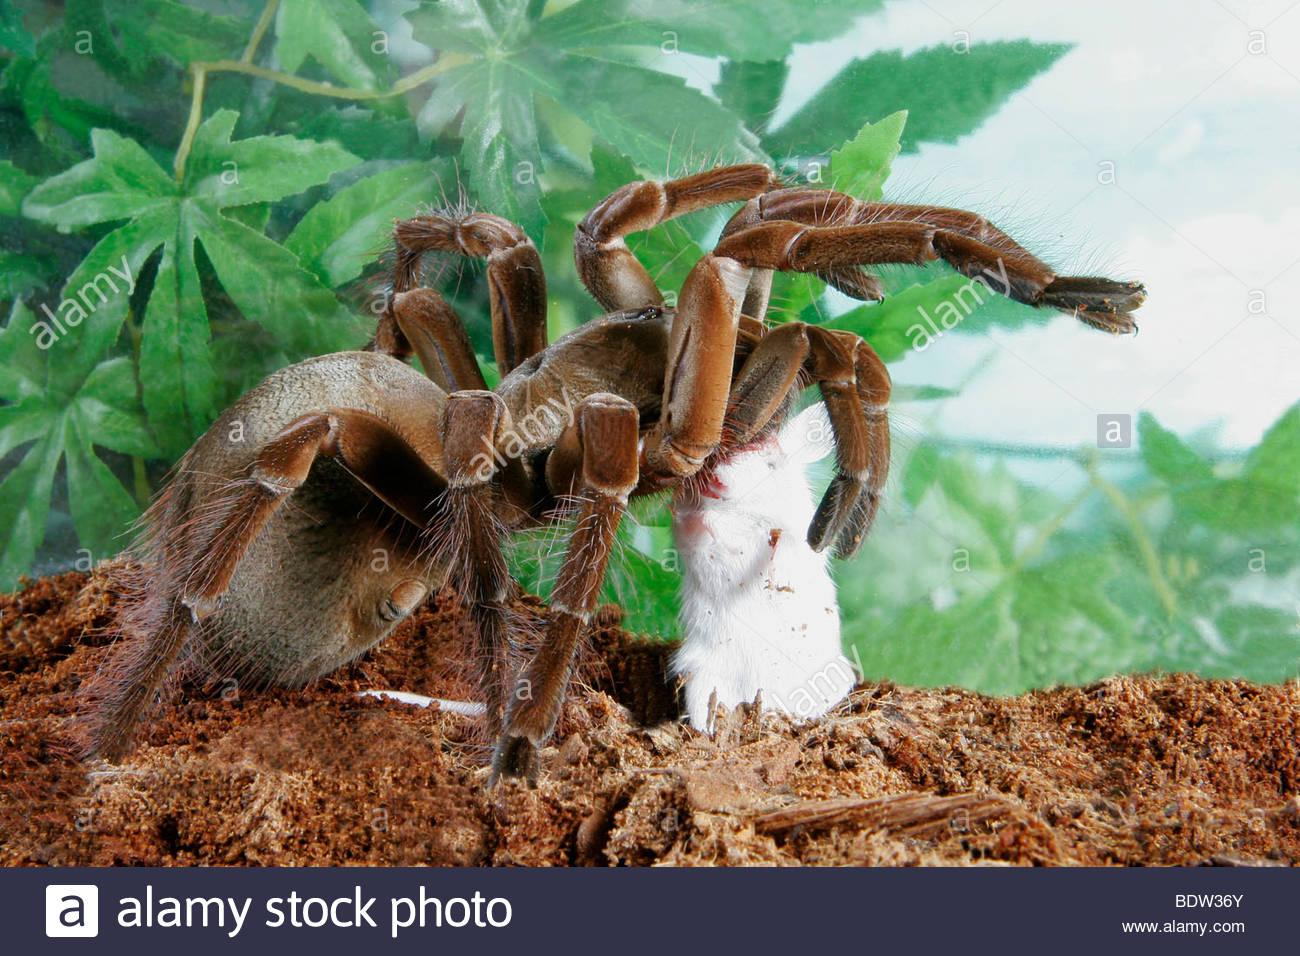 vogelspinne theraphosa blondi goliath spider stockfoto bild 25752243 alamy. Black Bedroom Furniture Sets. Home Design Ideas